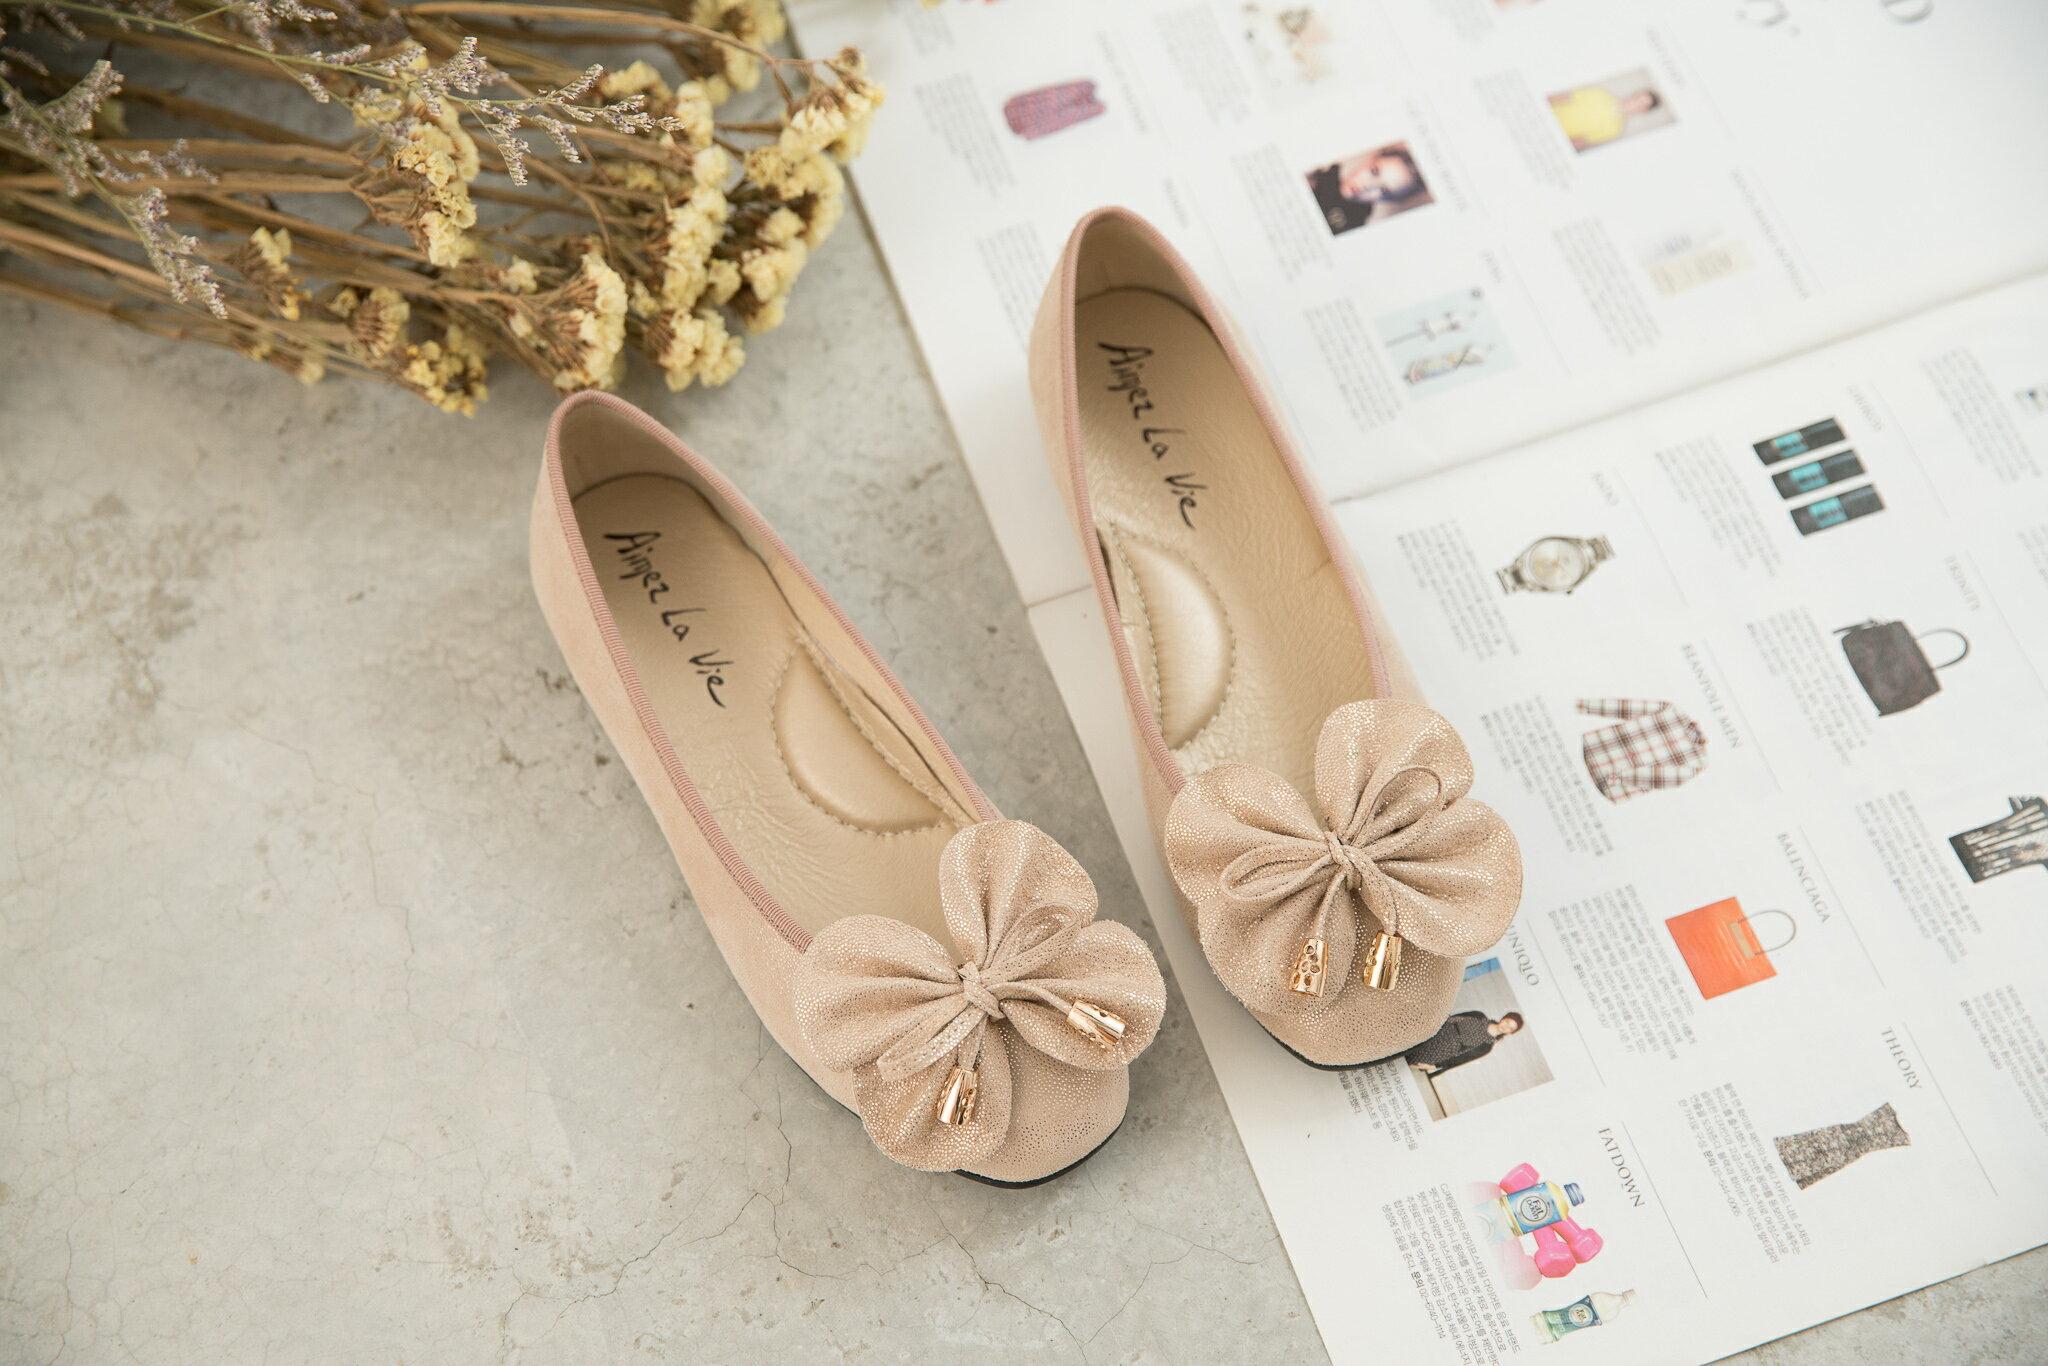 Aimez La Vie 經典優雅|大蝴蝶結金屬頭真皮平底娃娃鞋 2